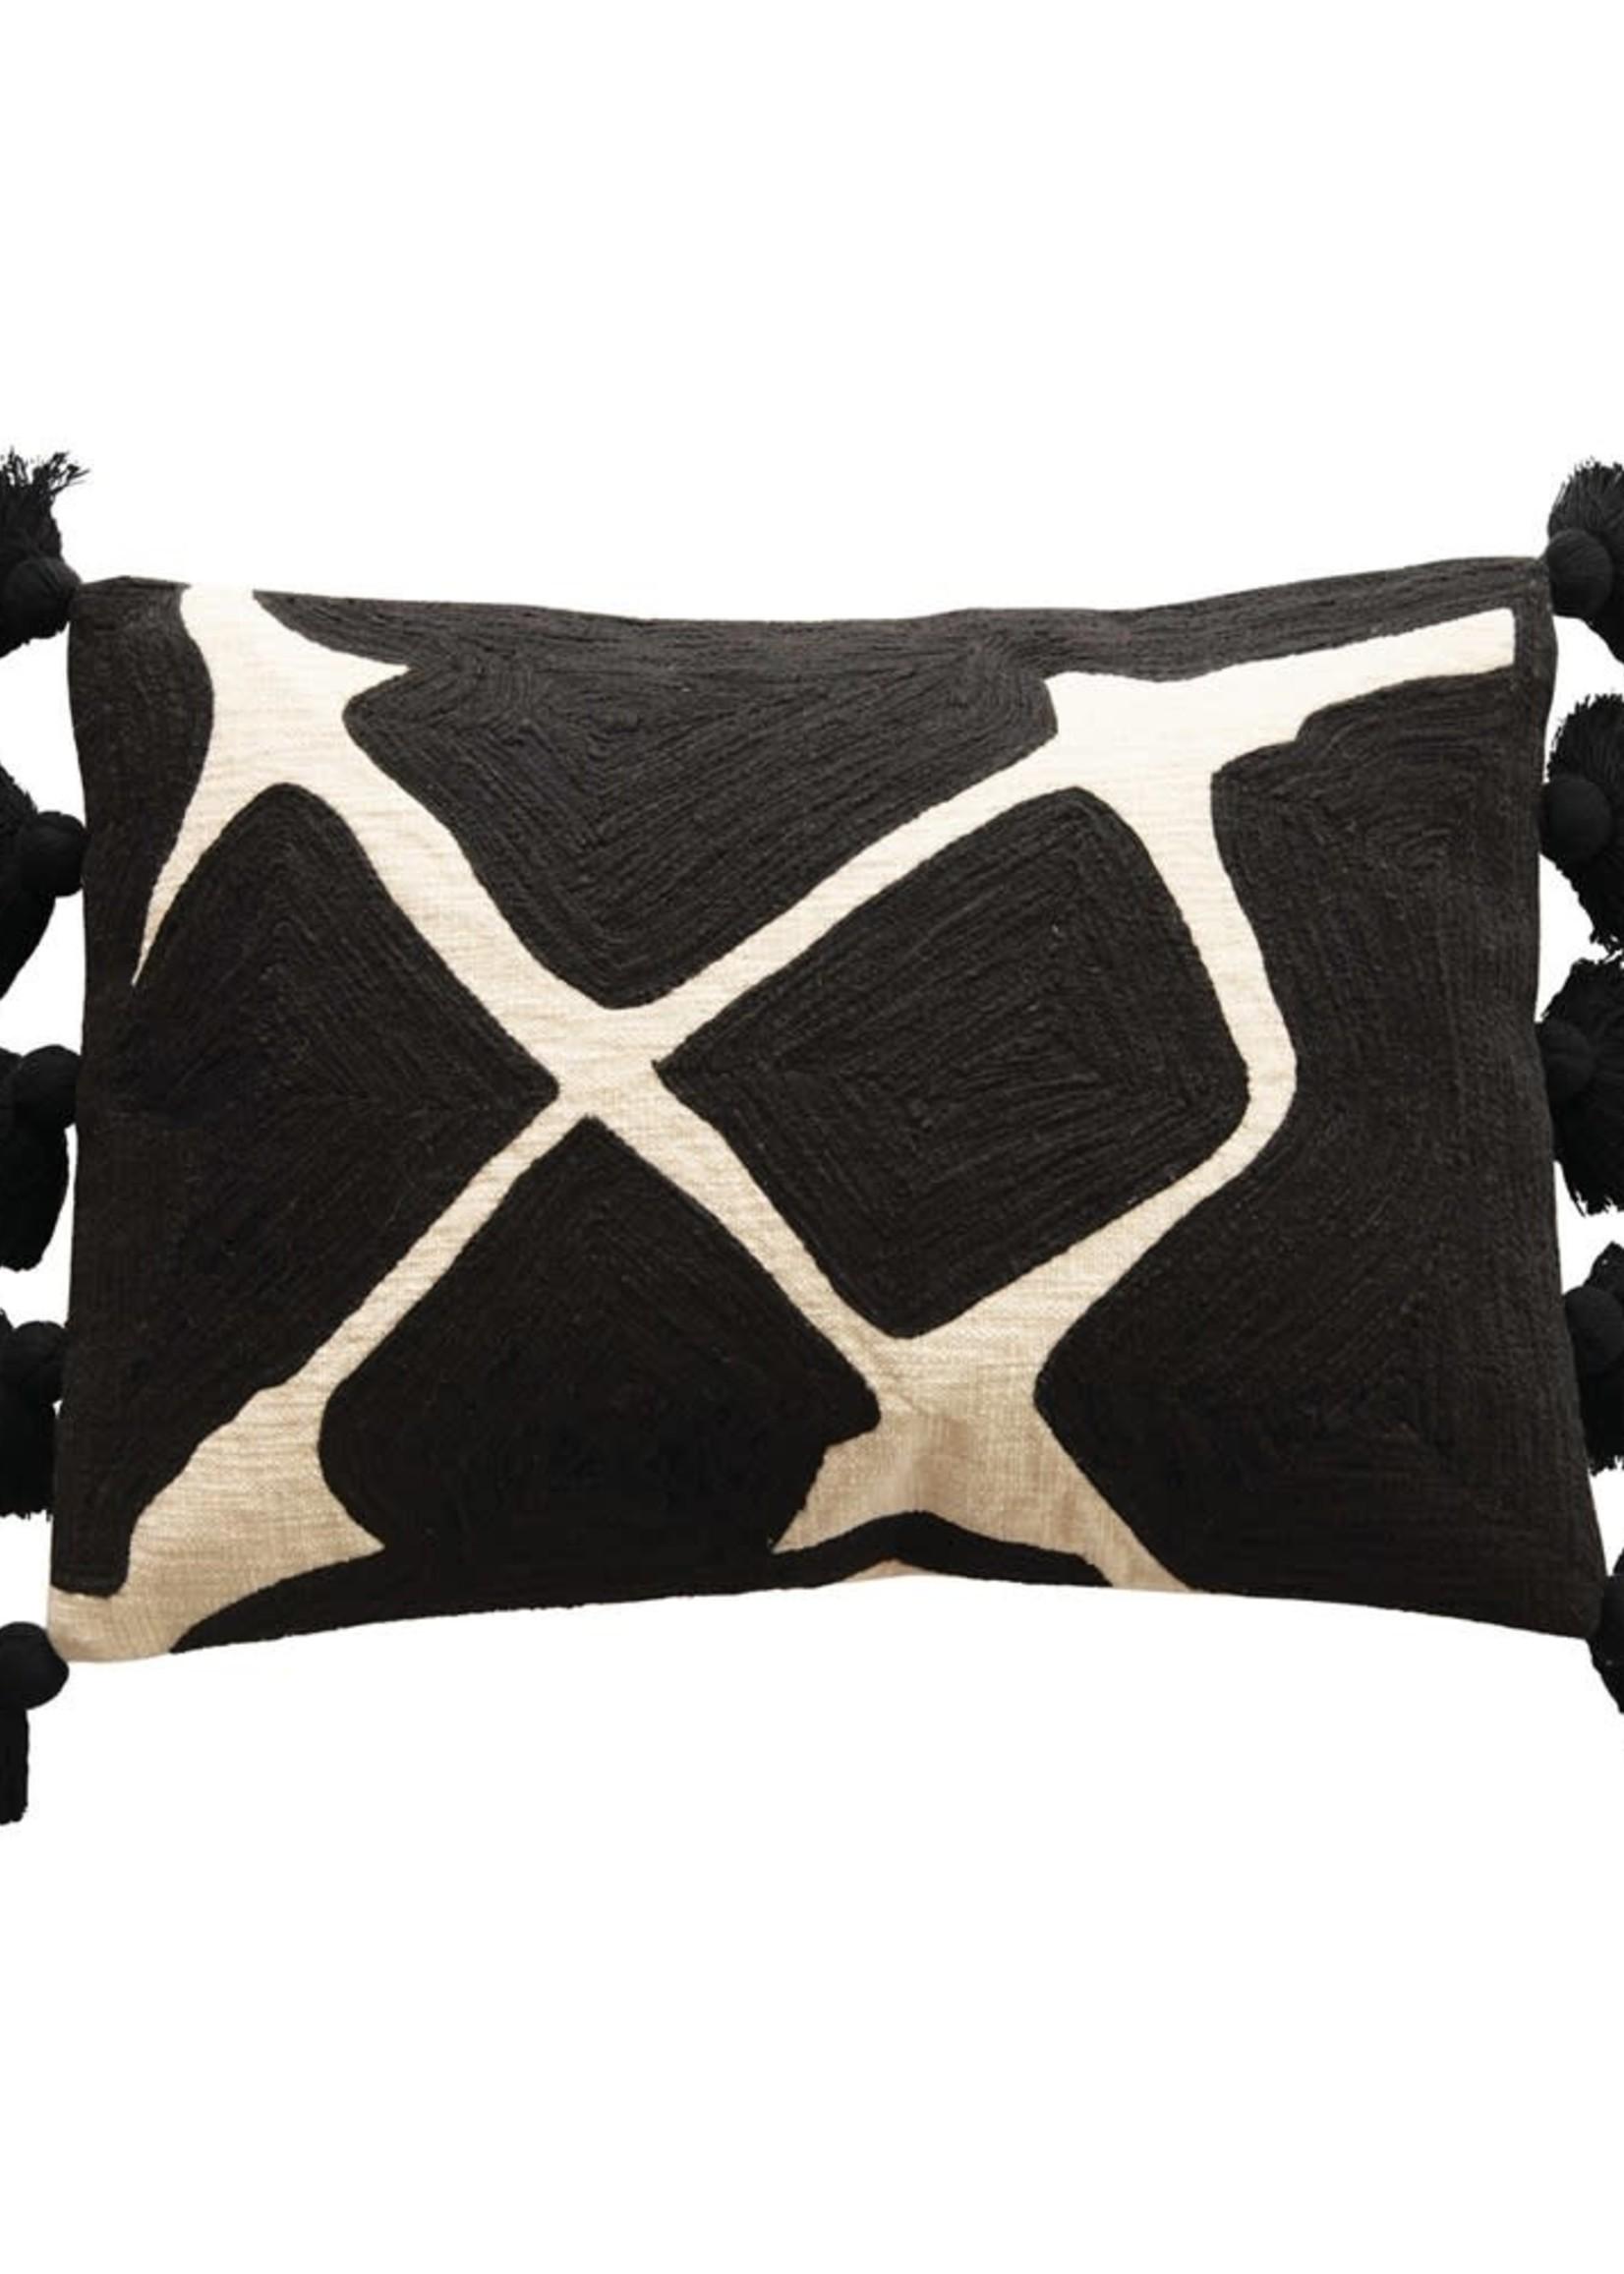 Cotton Oblong Lumbar Pillow